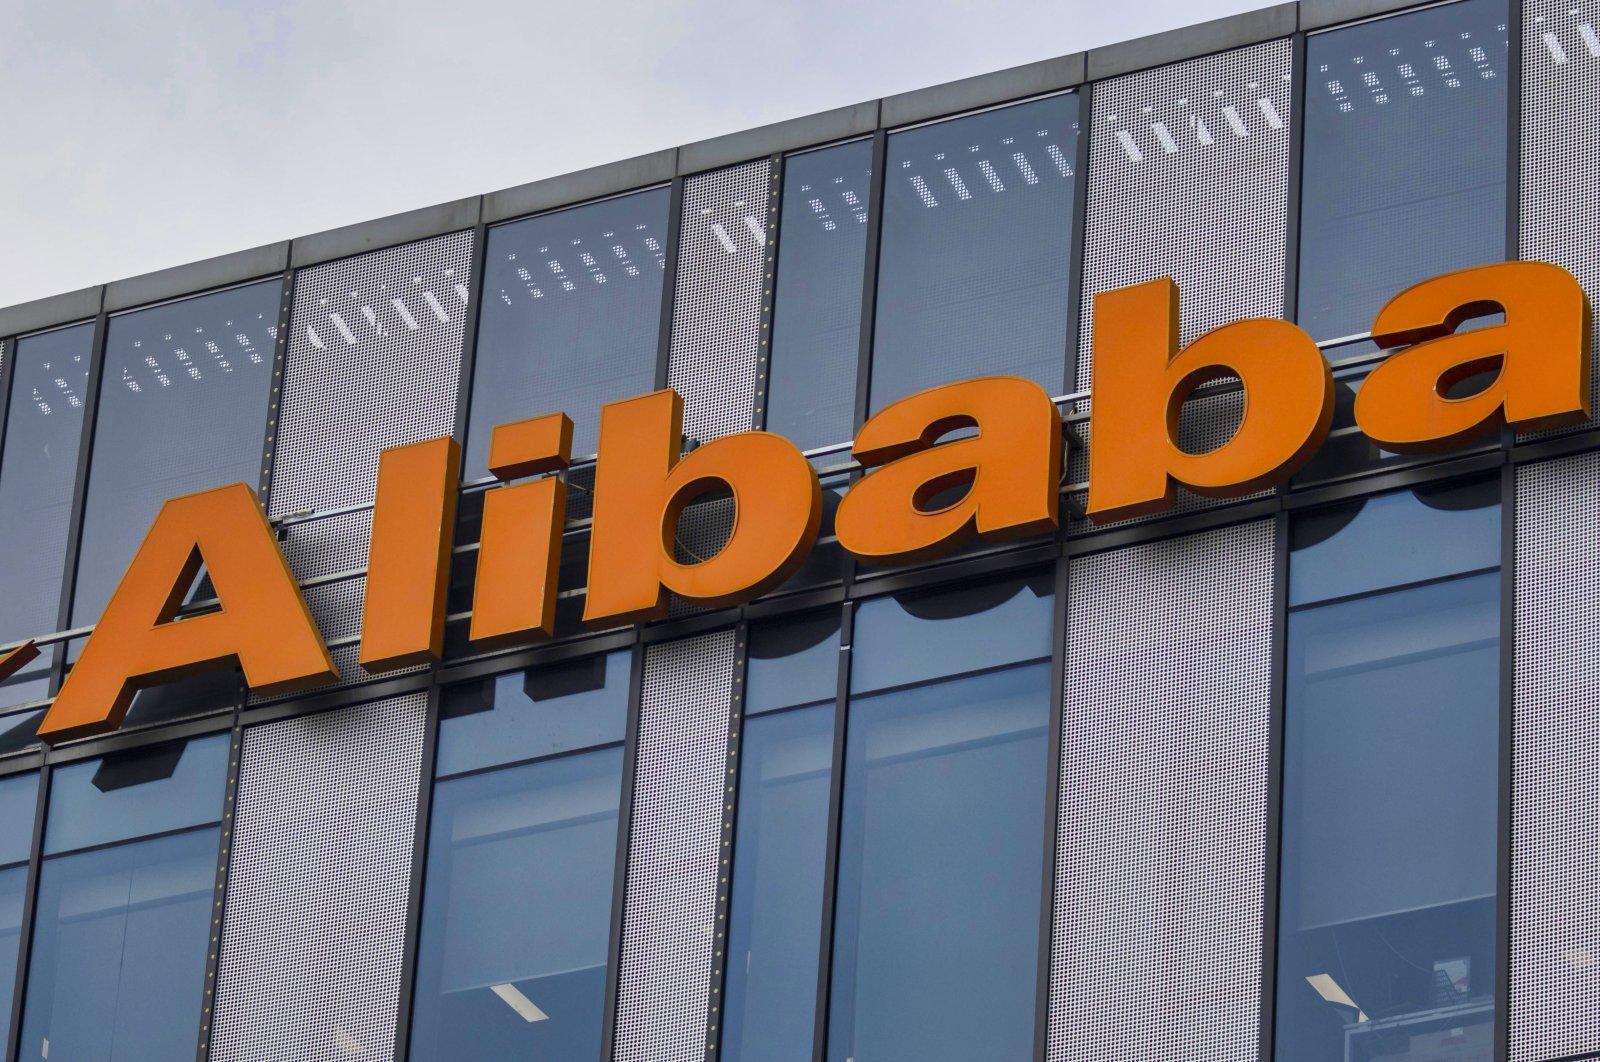 Alibaba Group's headquarters in Shanghai, China, July 21, 2020. (EPA Photo)